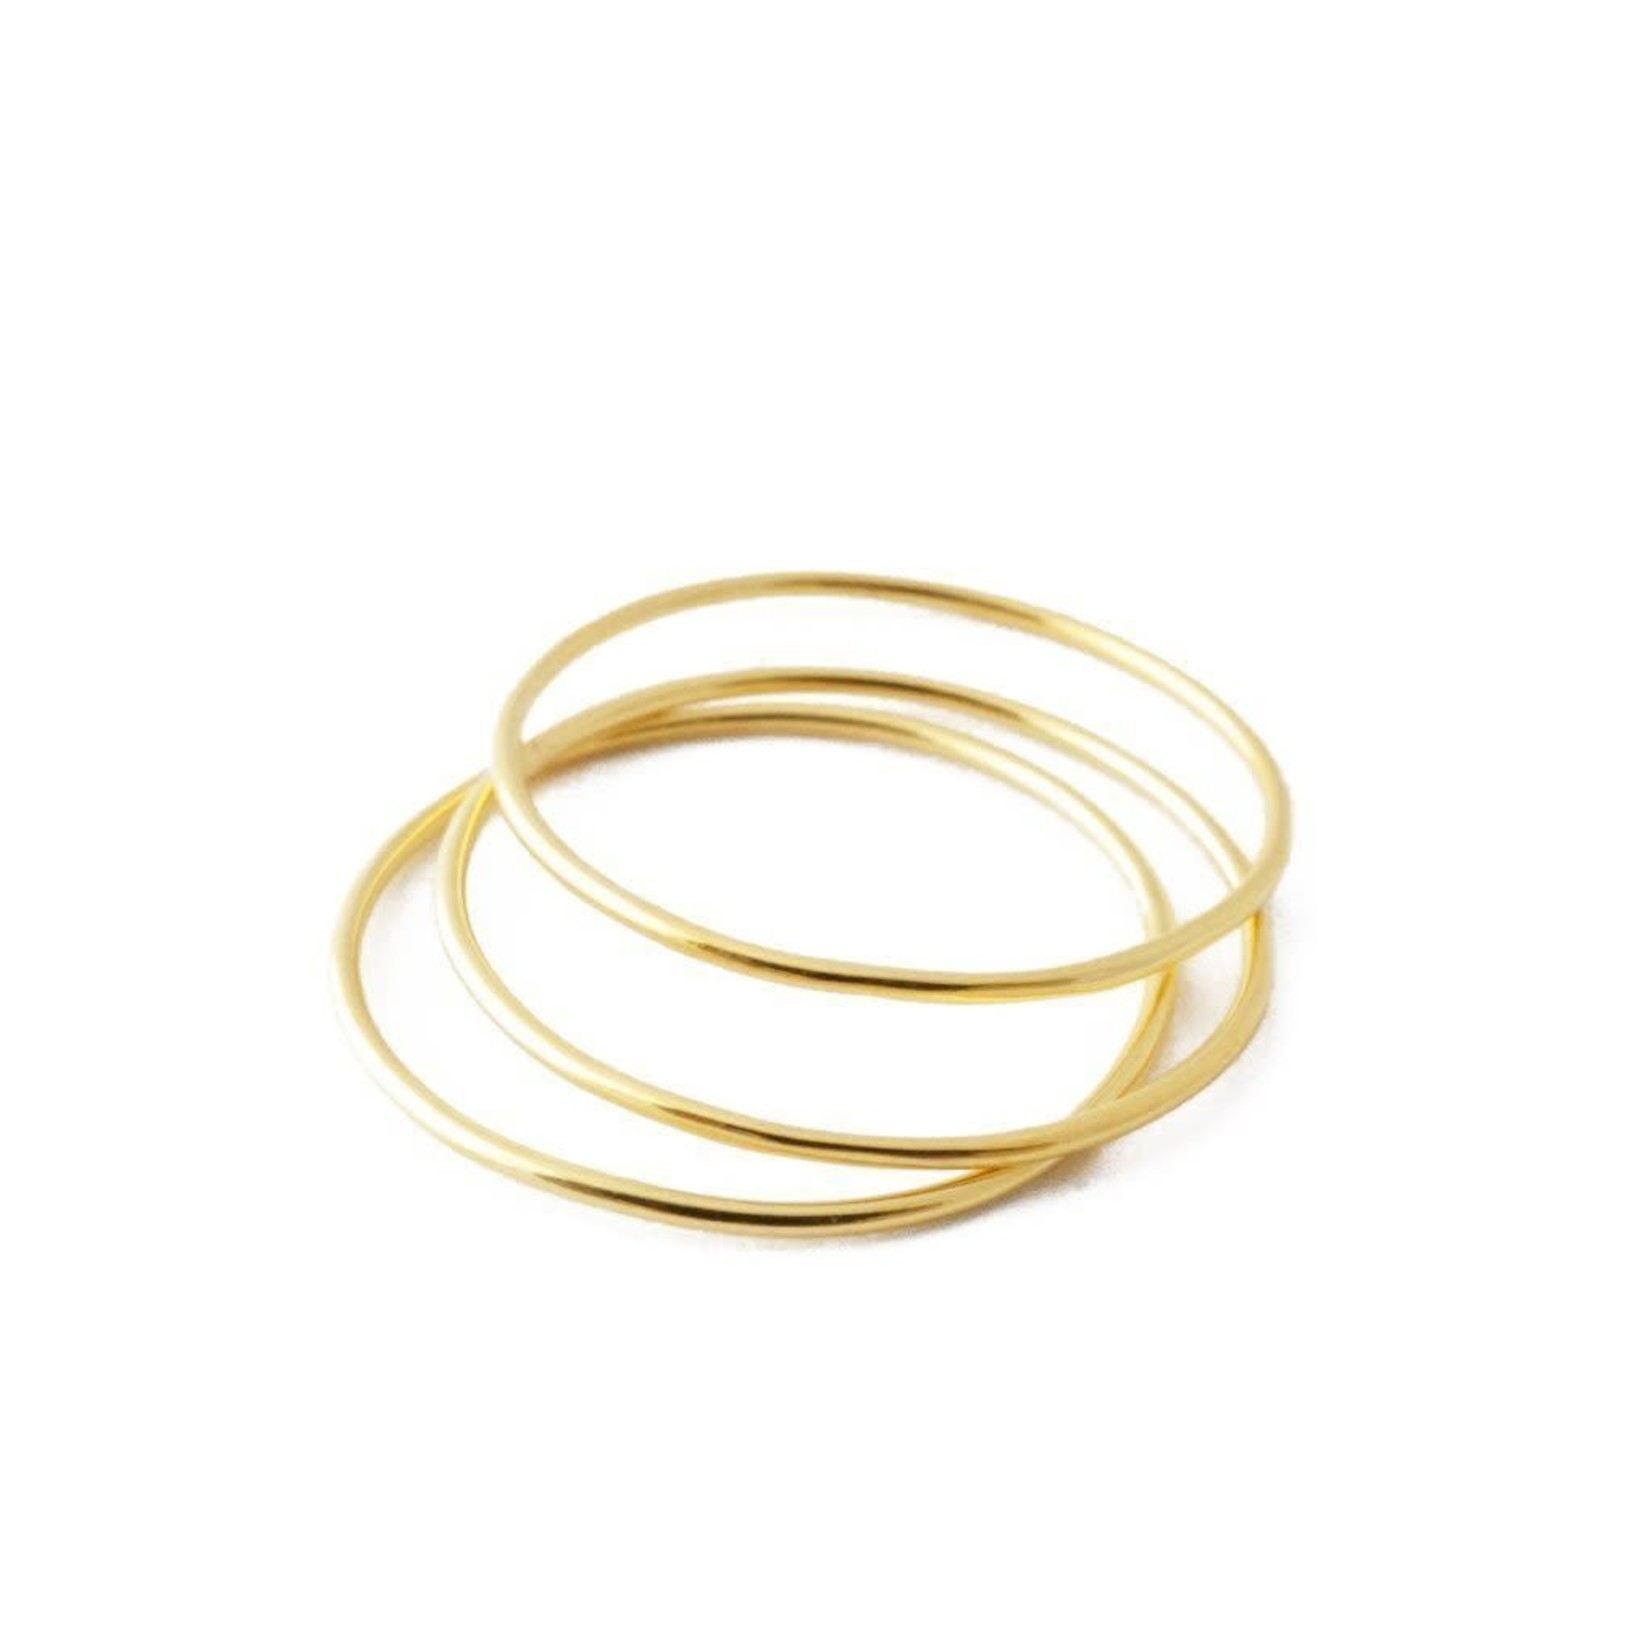 Honeycat Jewelry Super Skinny Stacking Rings by Honeycat Jewelry